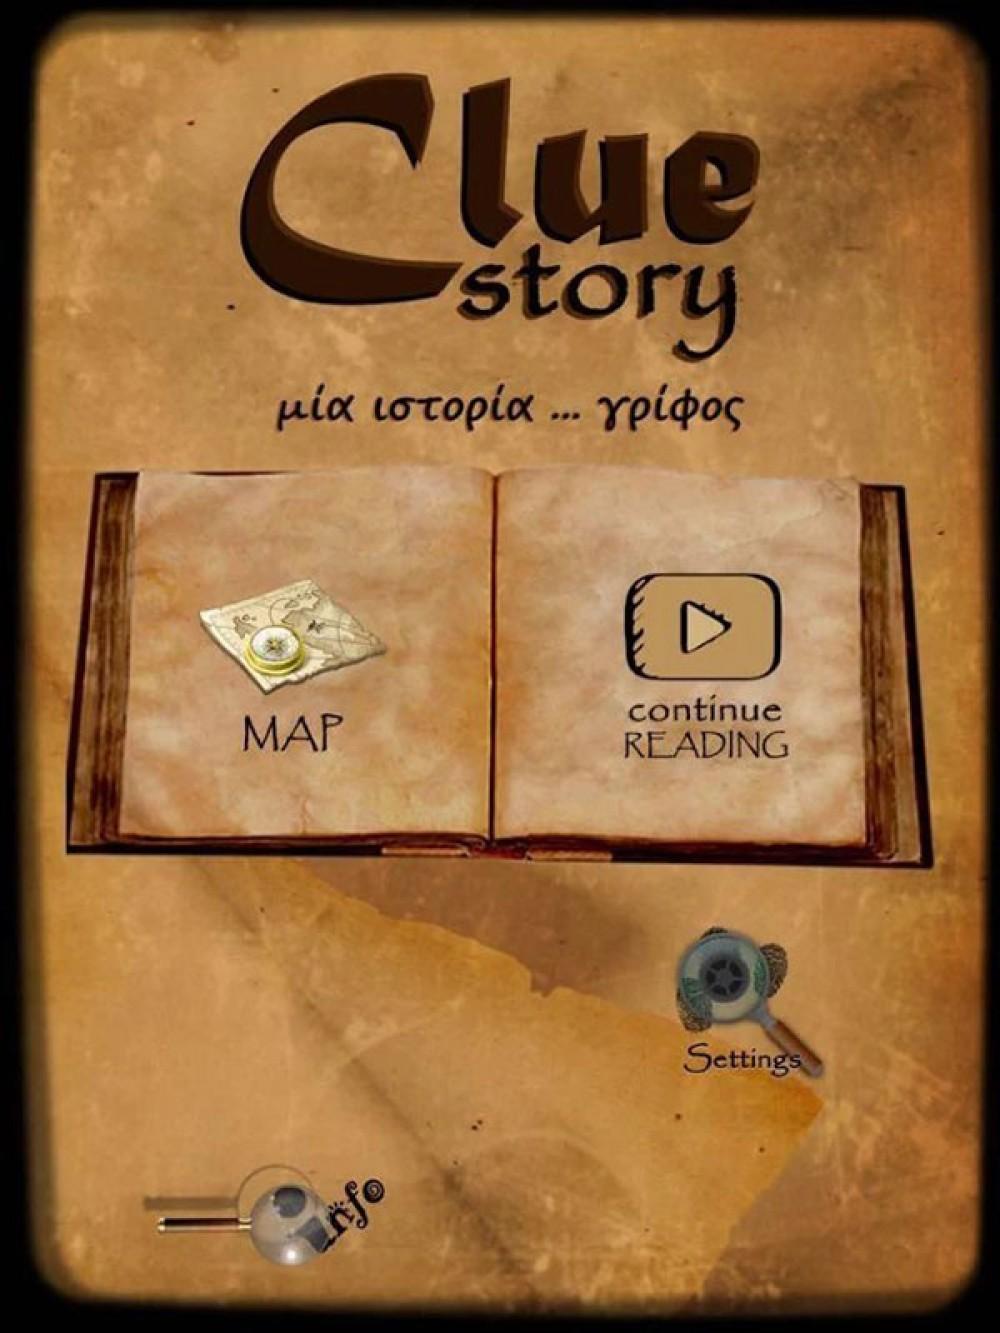 Clue Story: Ένα εξαιρετικό, πρωτότυπο, διαδραστικό και δωρεάν παιχνίδι από Έλληνα δημιουργό [Video]